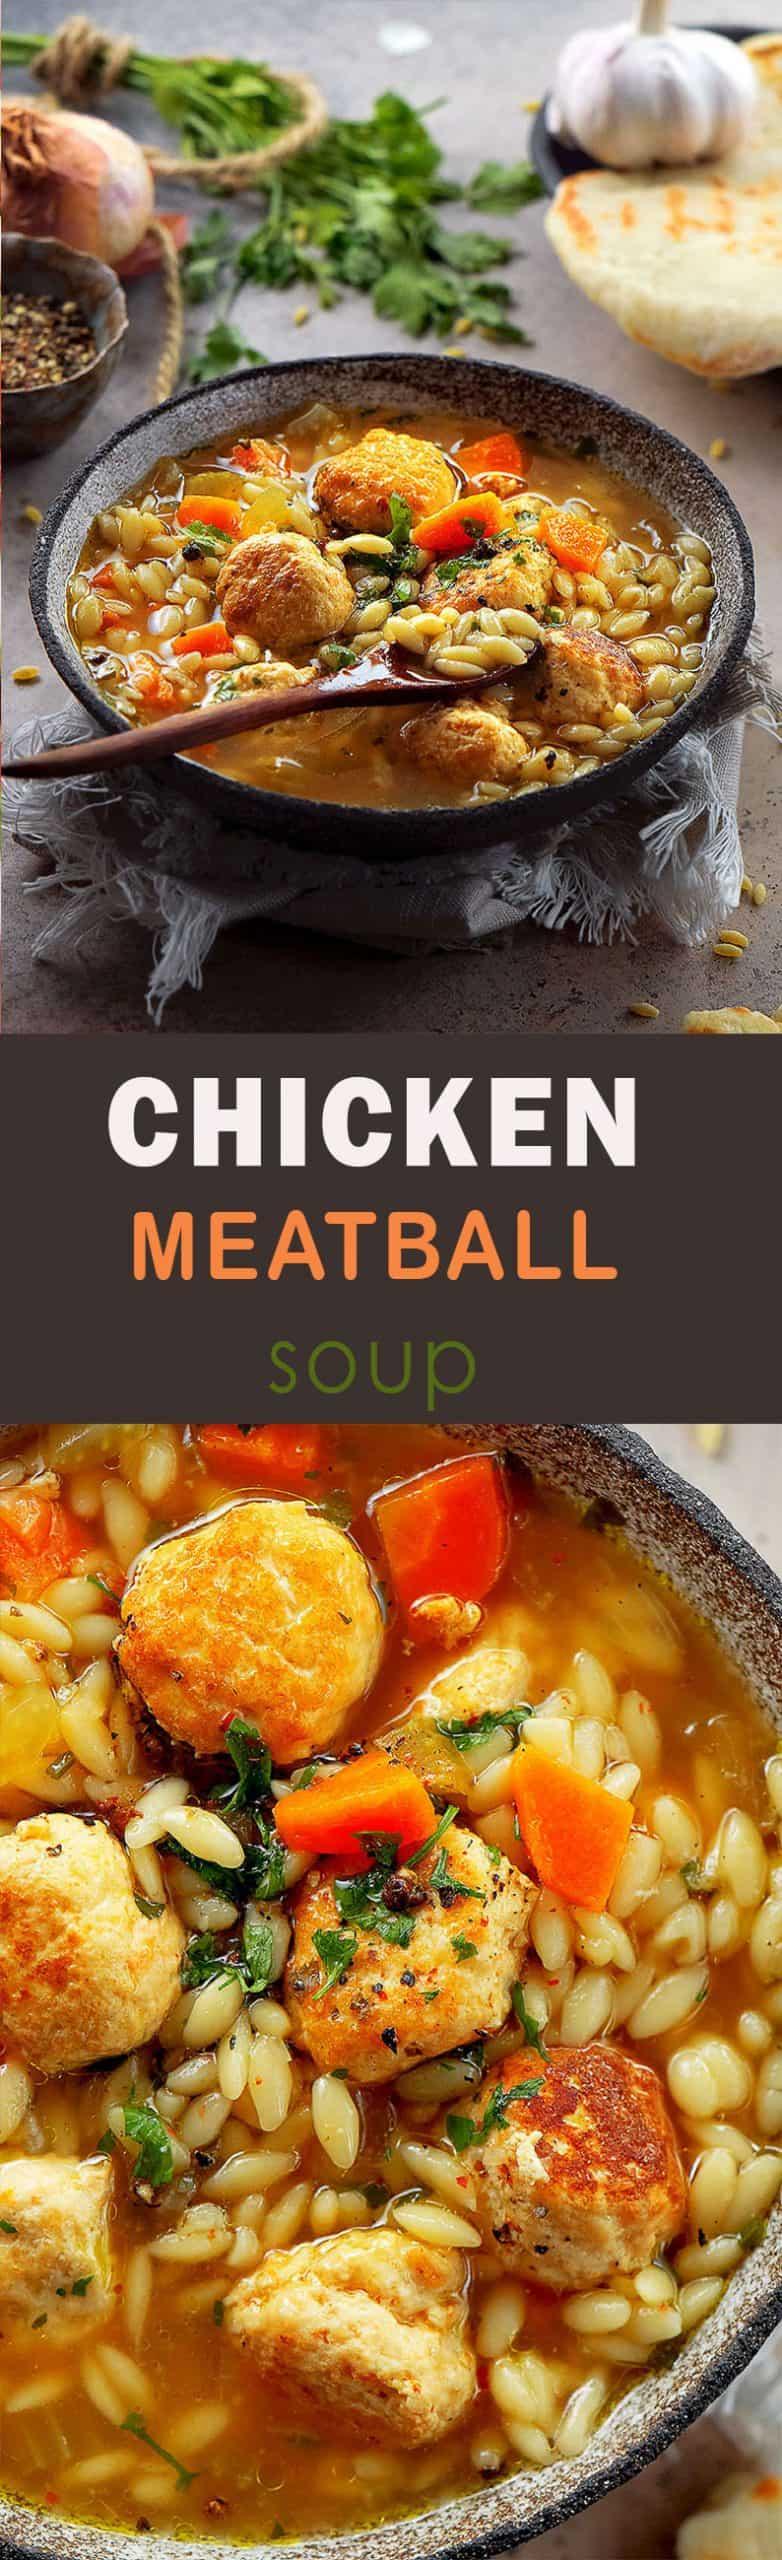 chicken-meatballs-soup